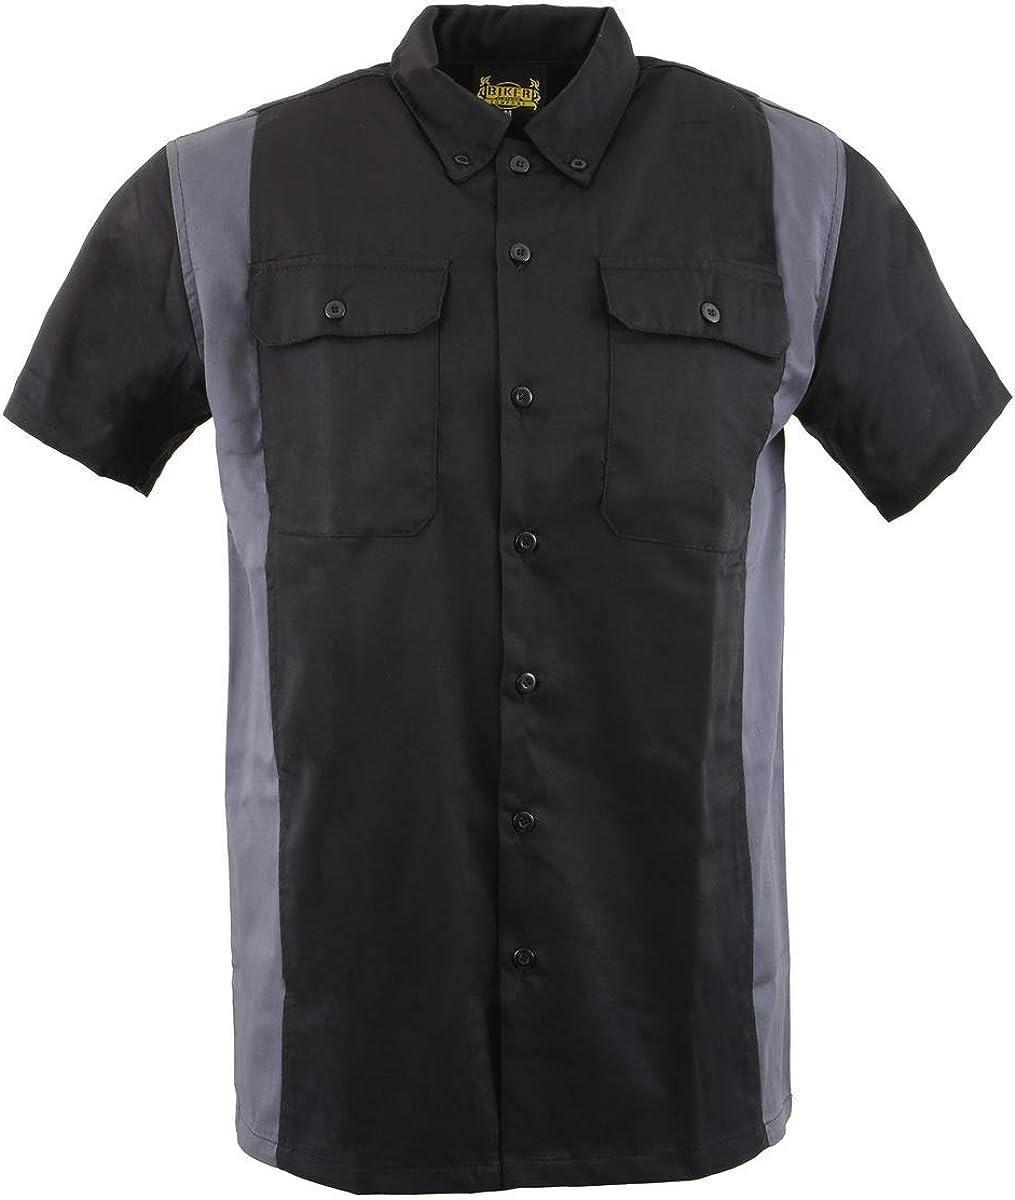 Biker Clothing Co. MDM11674.01 Men's Two-Tone Black and Grey Short Sleeve Motorcycle Mechanic Shirt